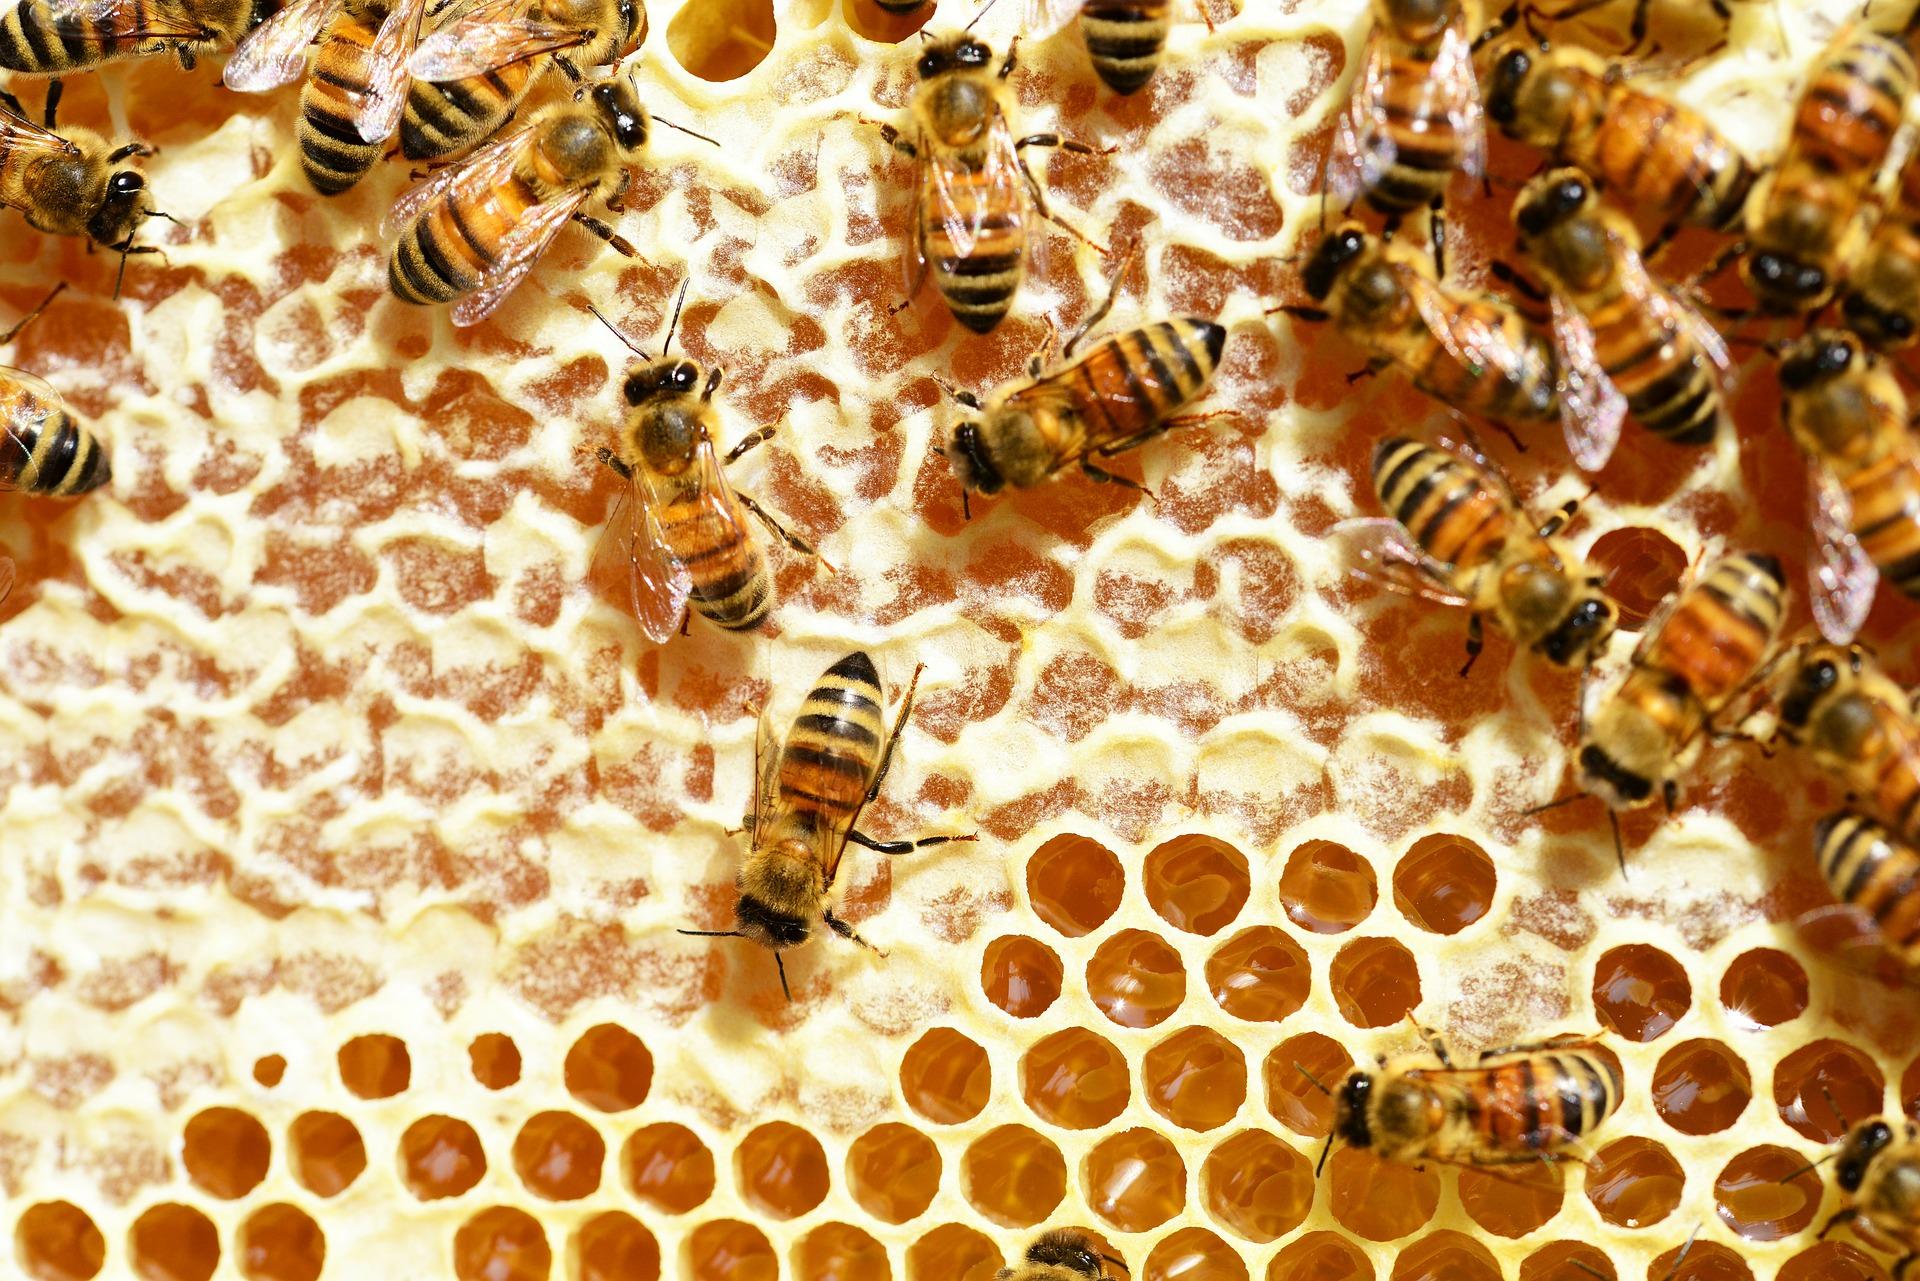 organic-honey-reston-farm-market-va-golden-angels-apiary.jpg